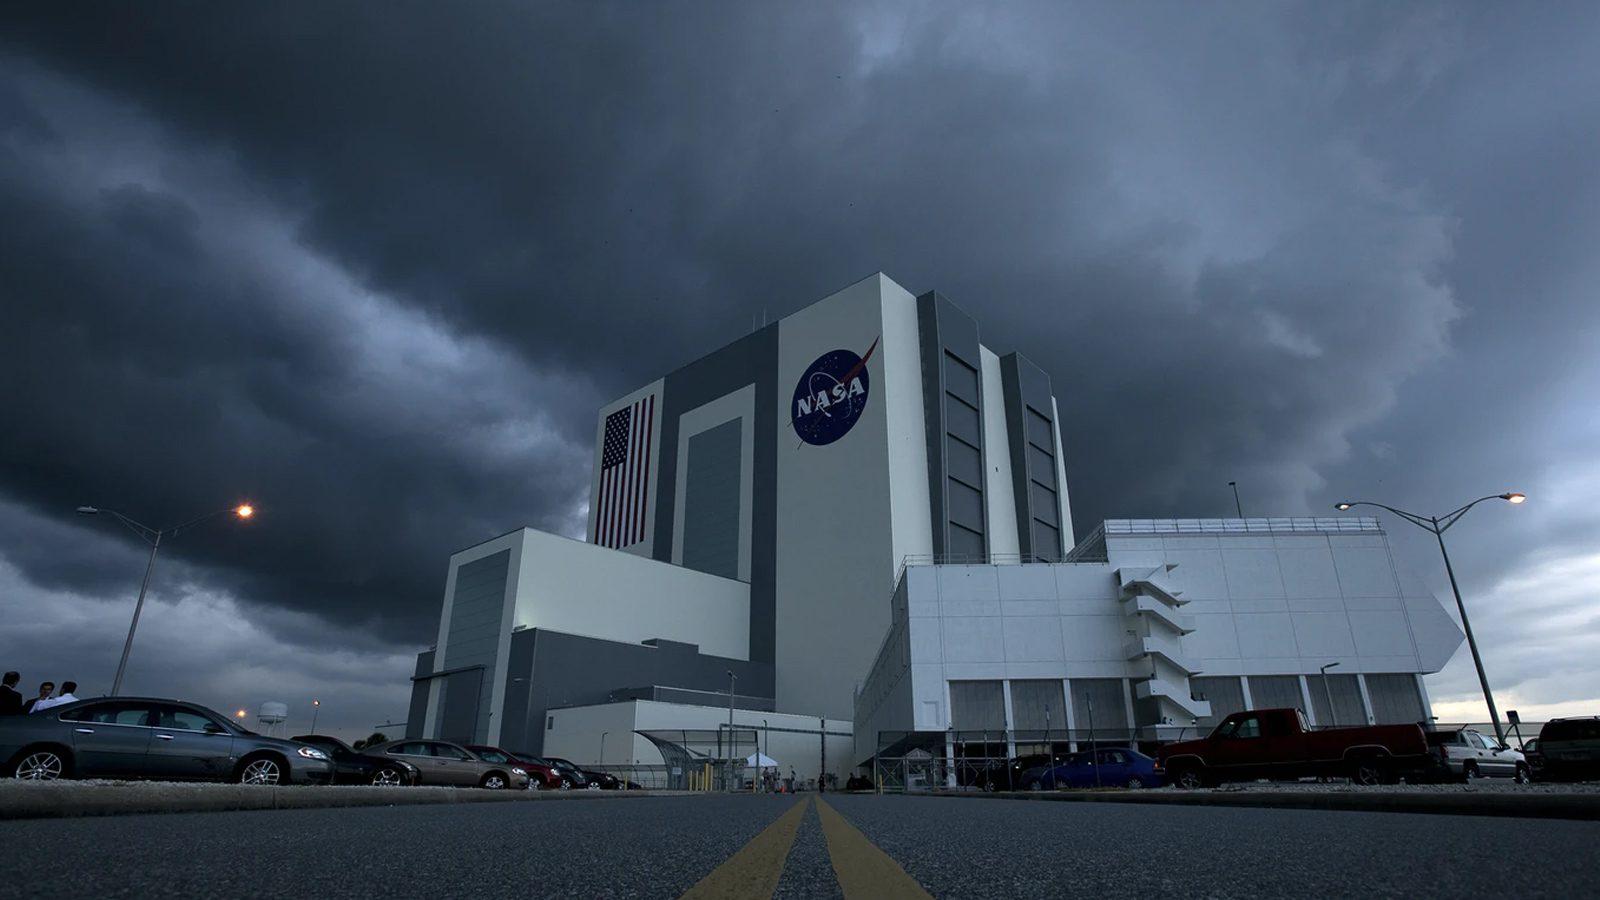 Nasa Space Agency